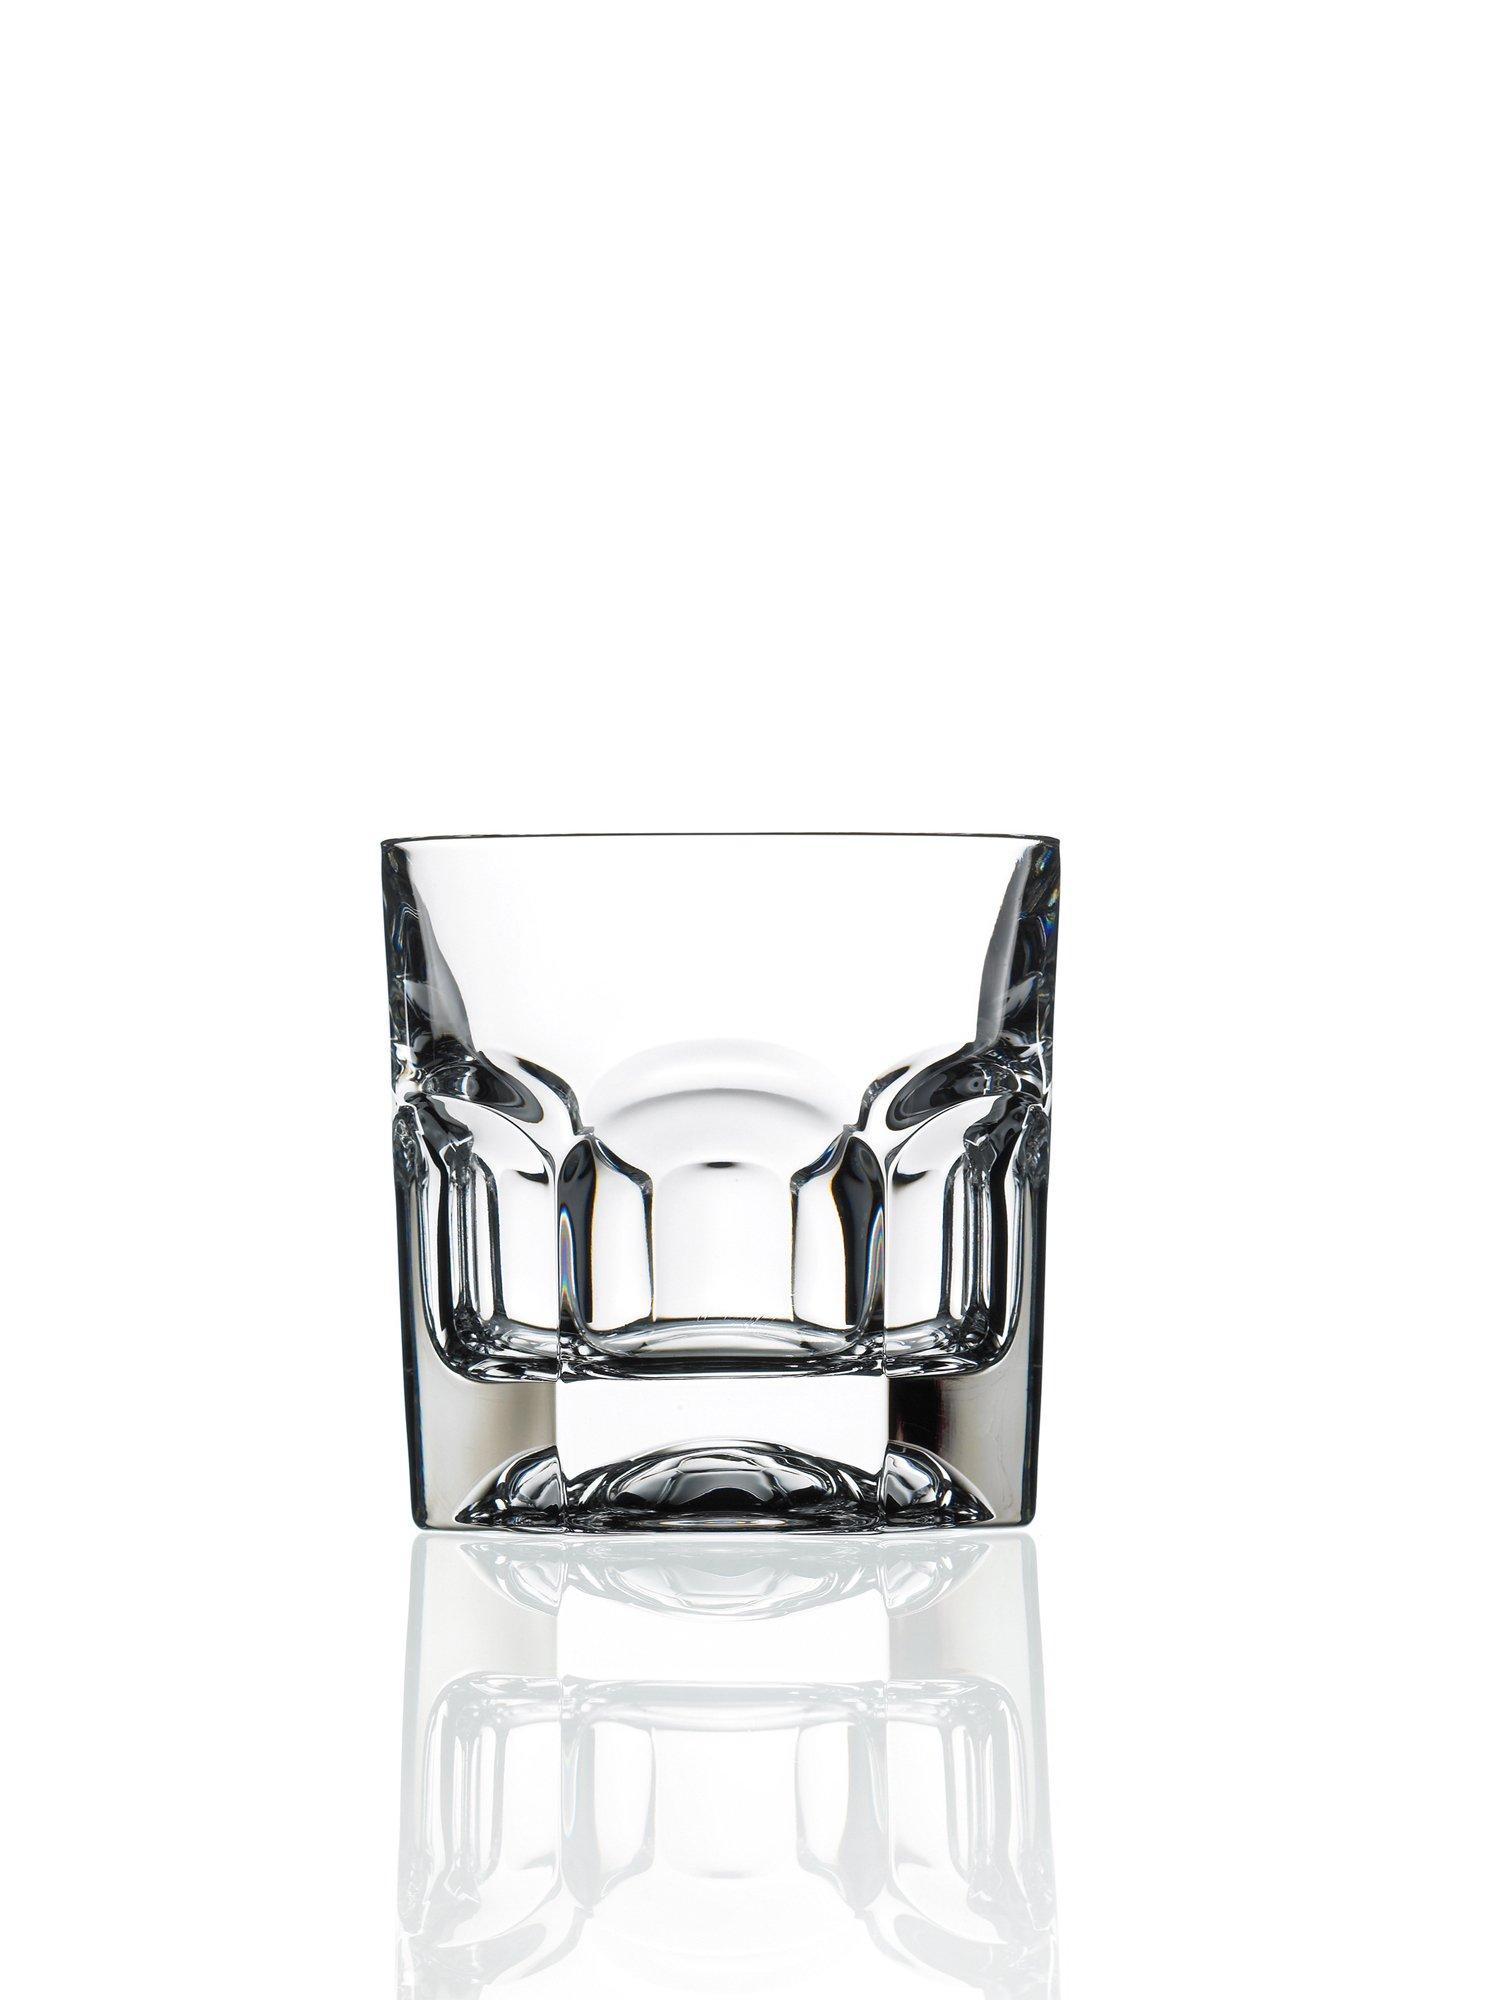 RCR Provenza Crystal Short Whisky Water Tumblers Glasses, 6.5oz, Set of 6